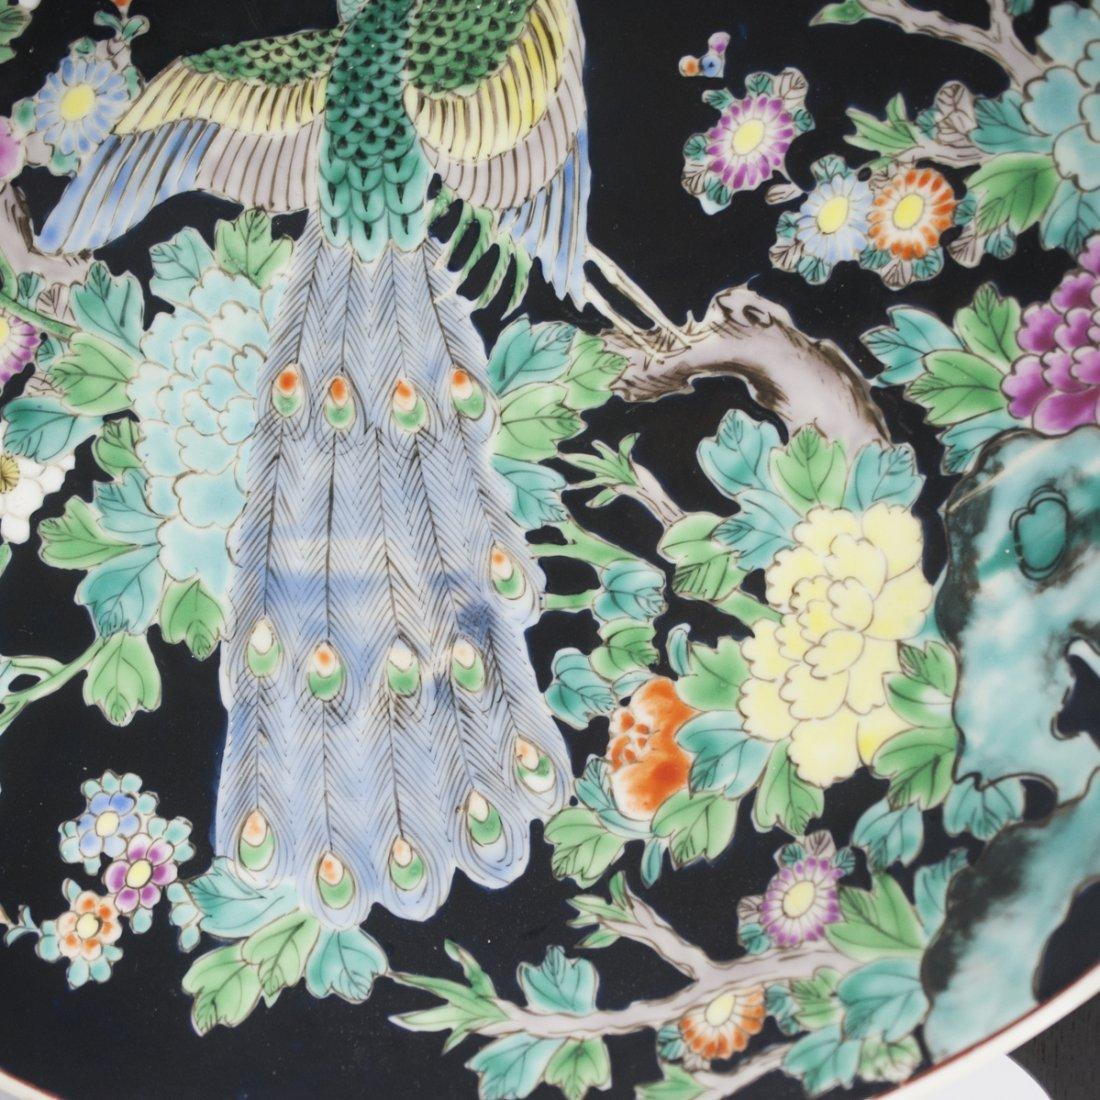 Japanese Famille Noire Porcelain Charger - 2